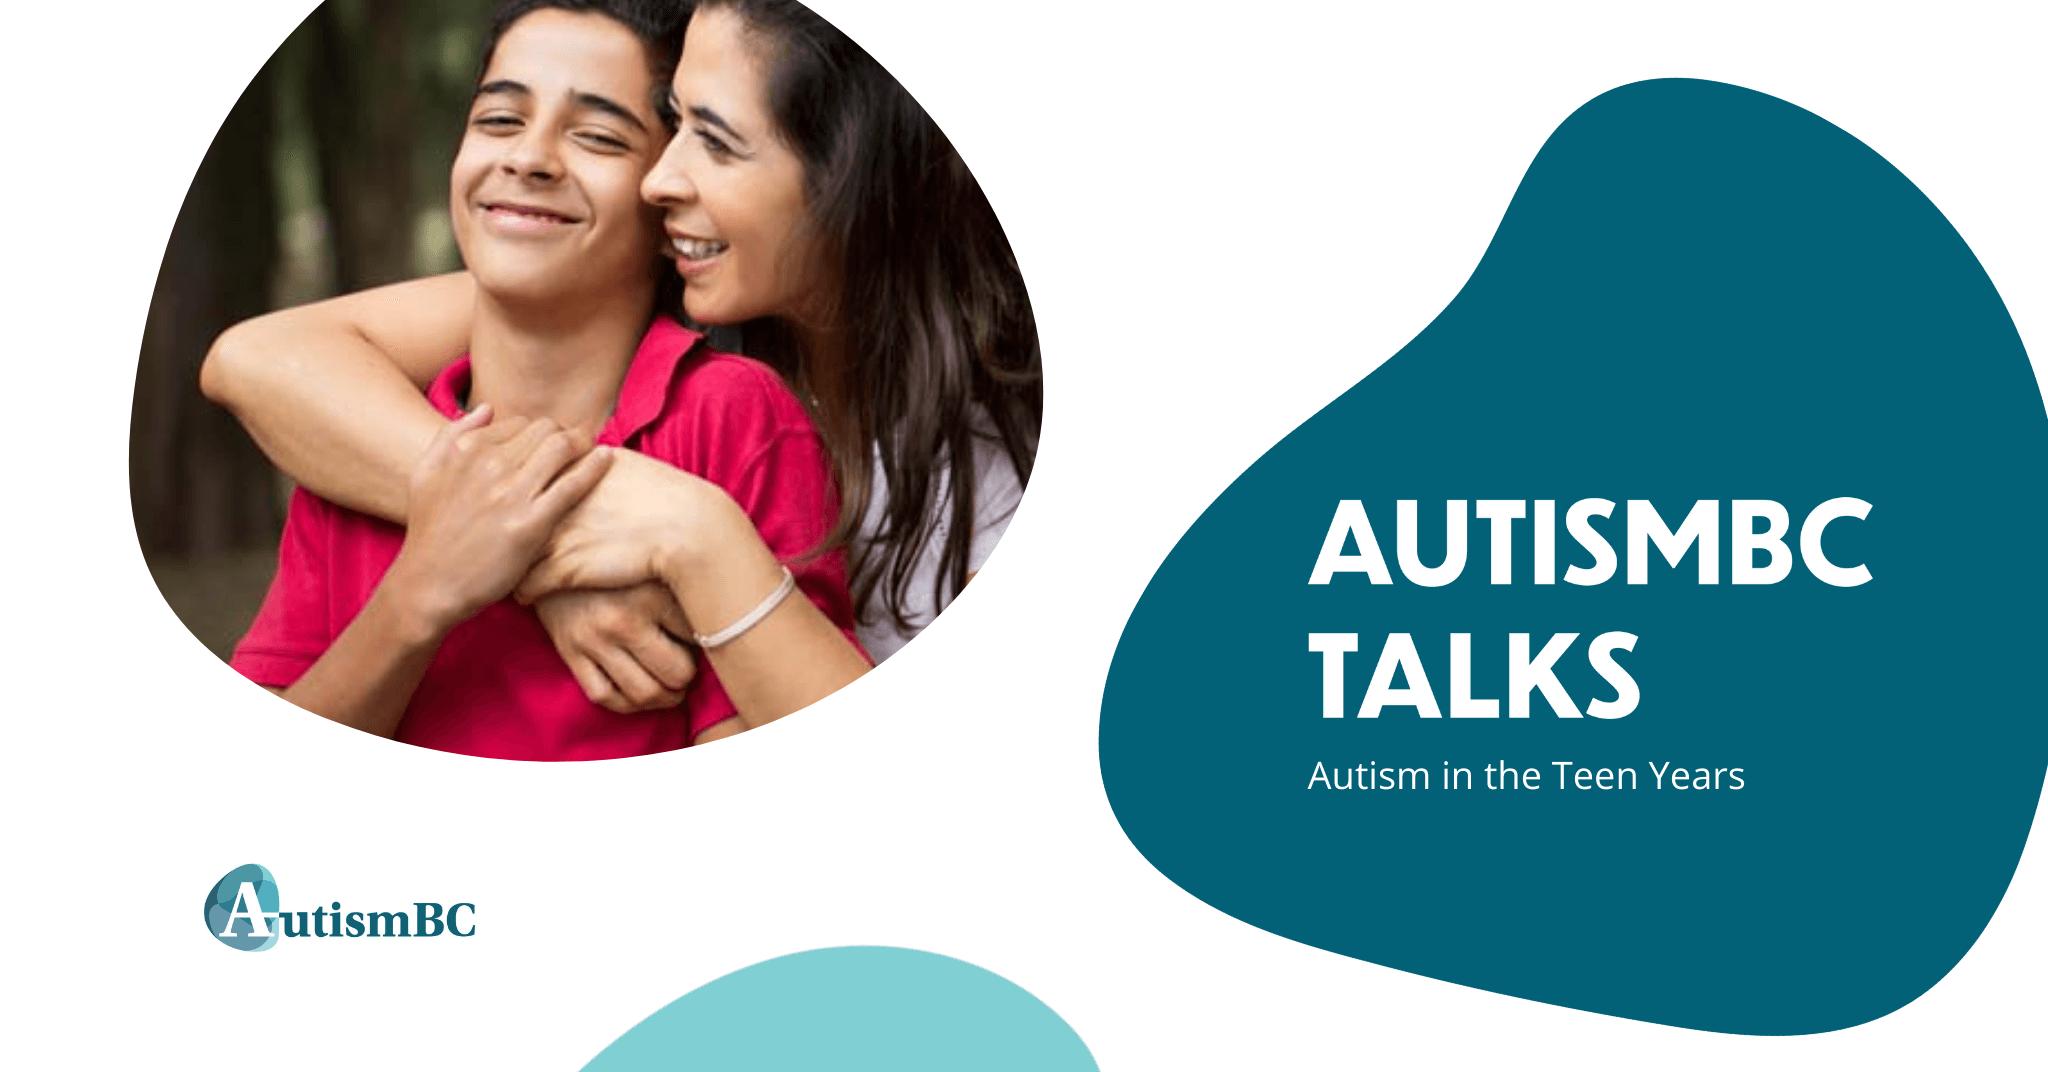 AutismBC Talks: Autism in the Teen Years